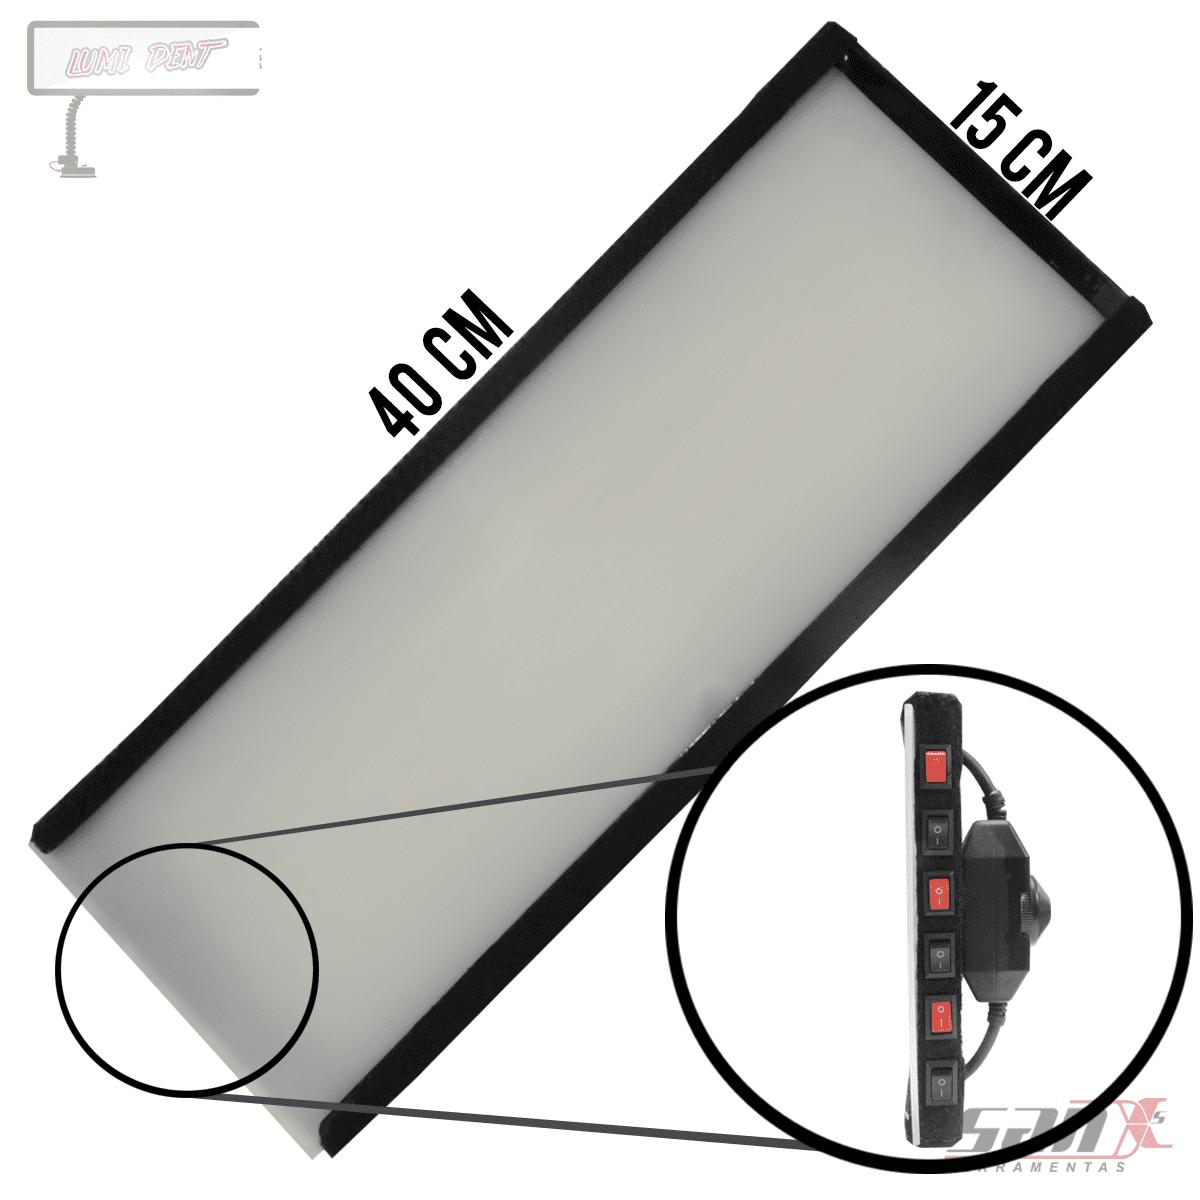 LUMINÁRIA DE LED 15x40 cm - 6 LEDS c/ DIMMER